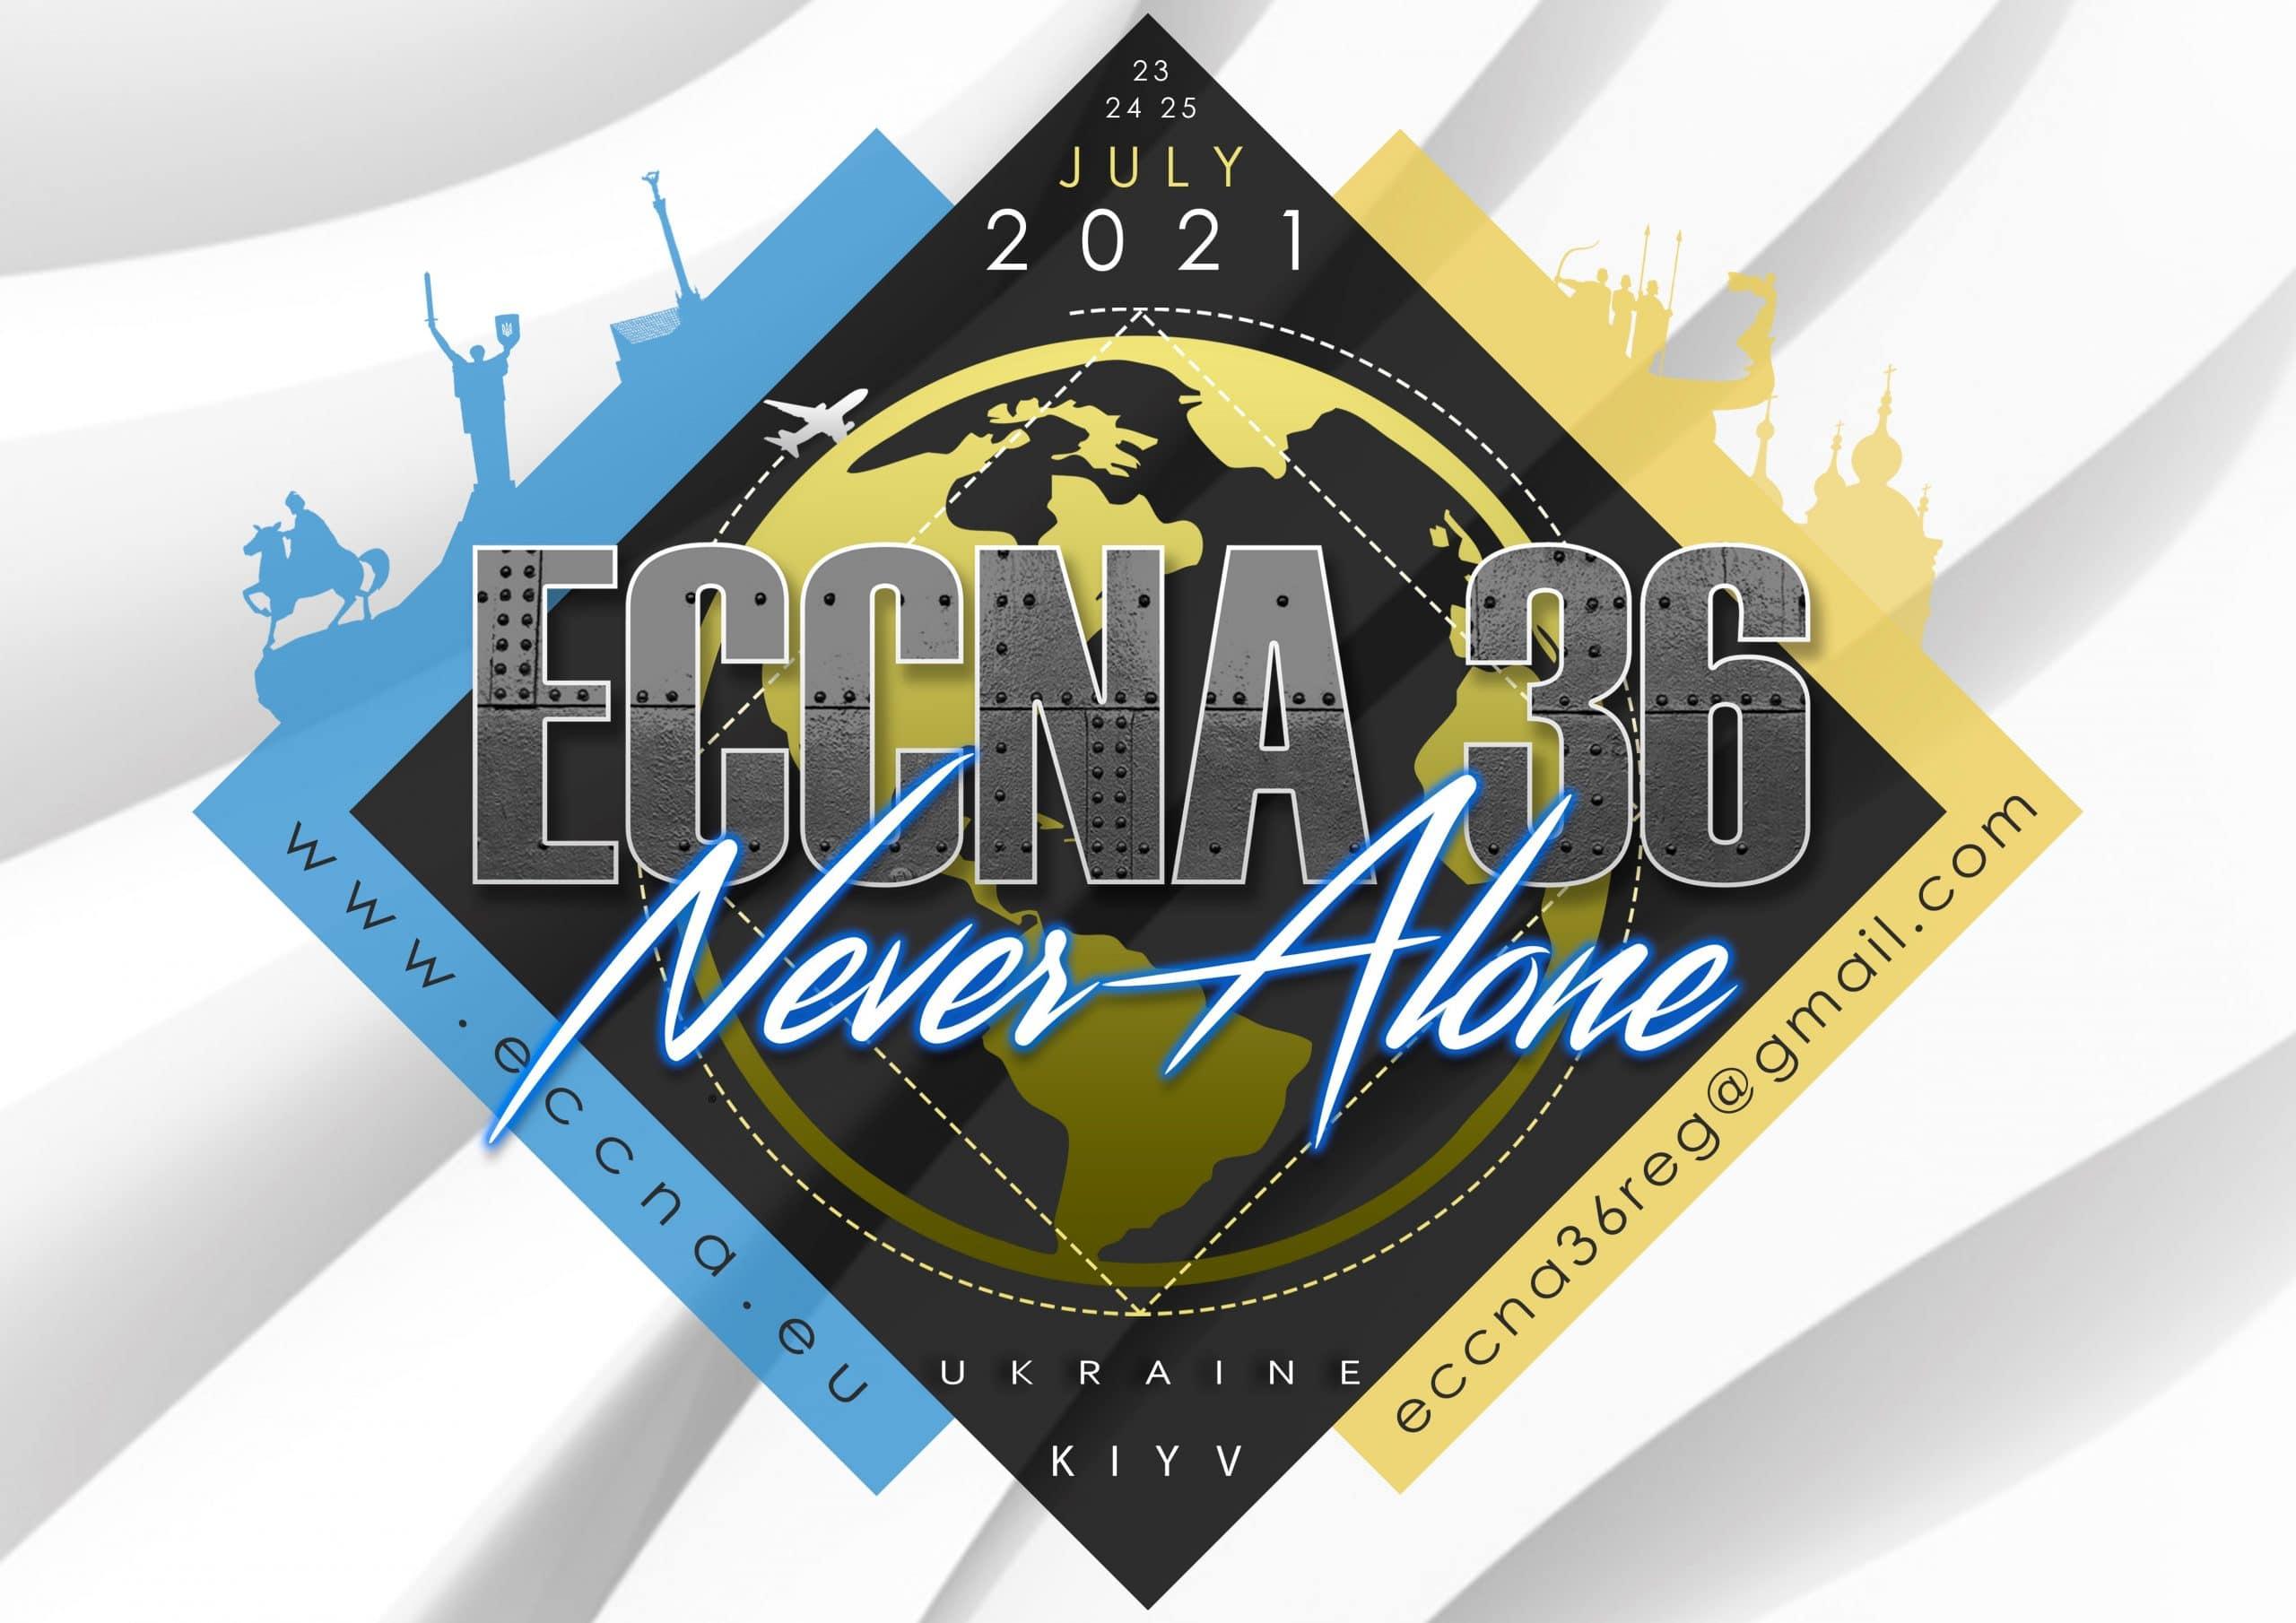 ECCNA 36